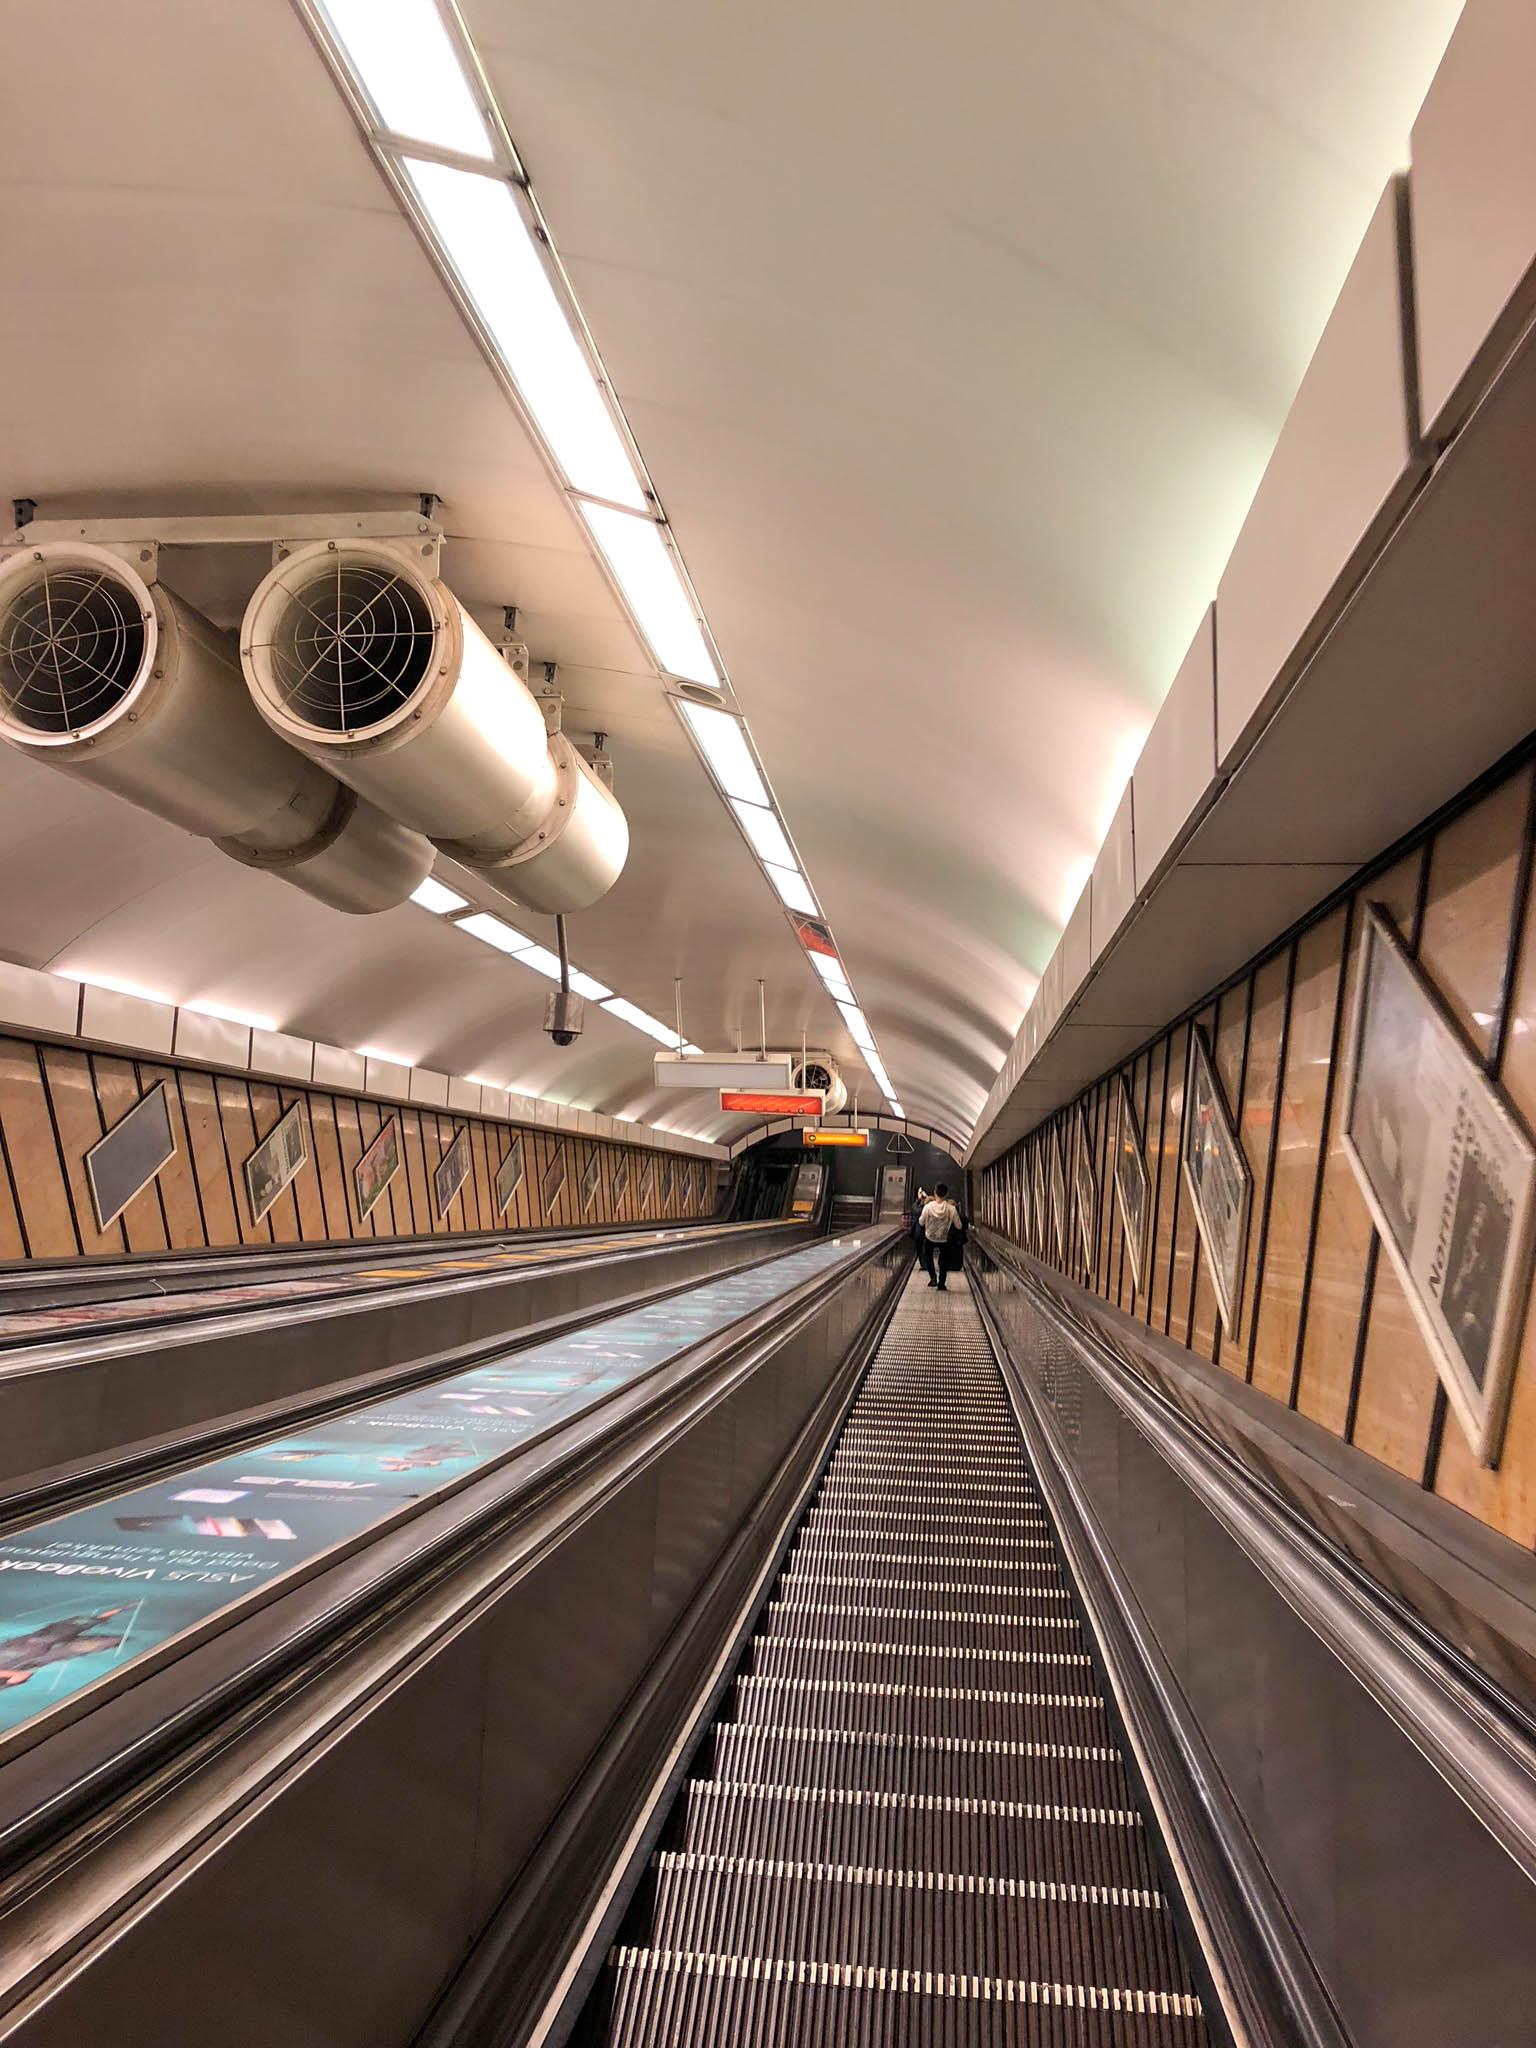 budapest hungary travel guide escalators